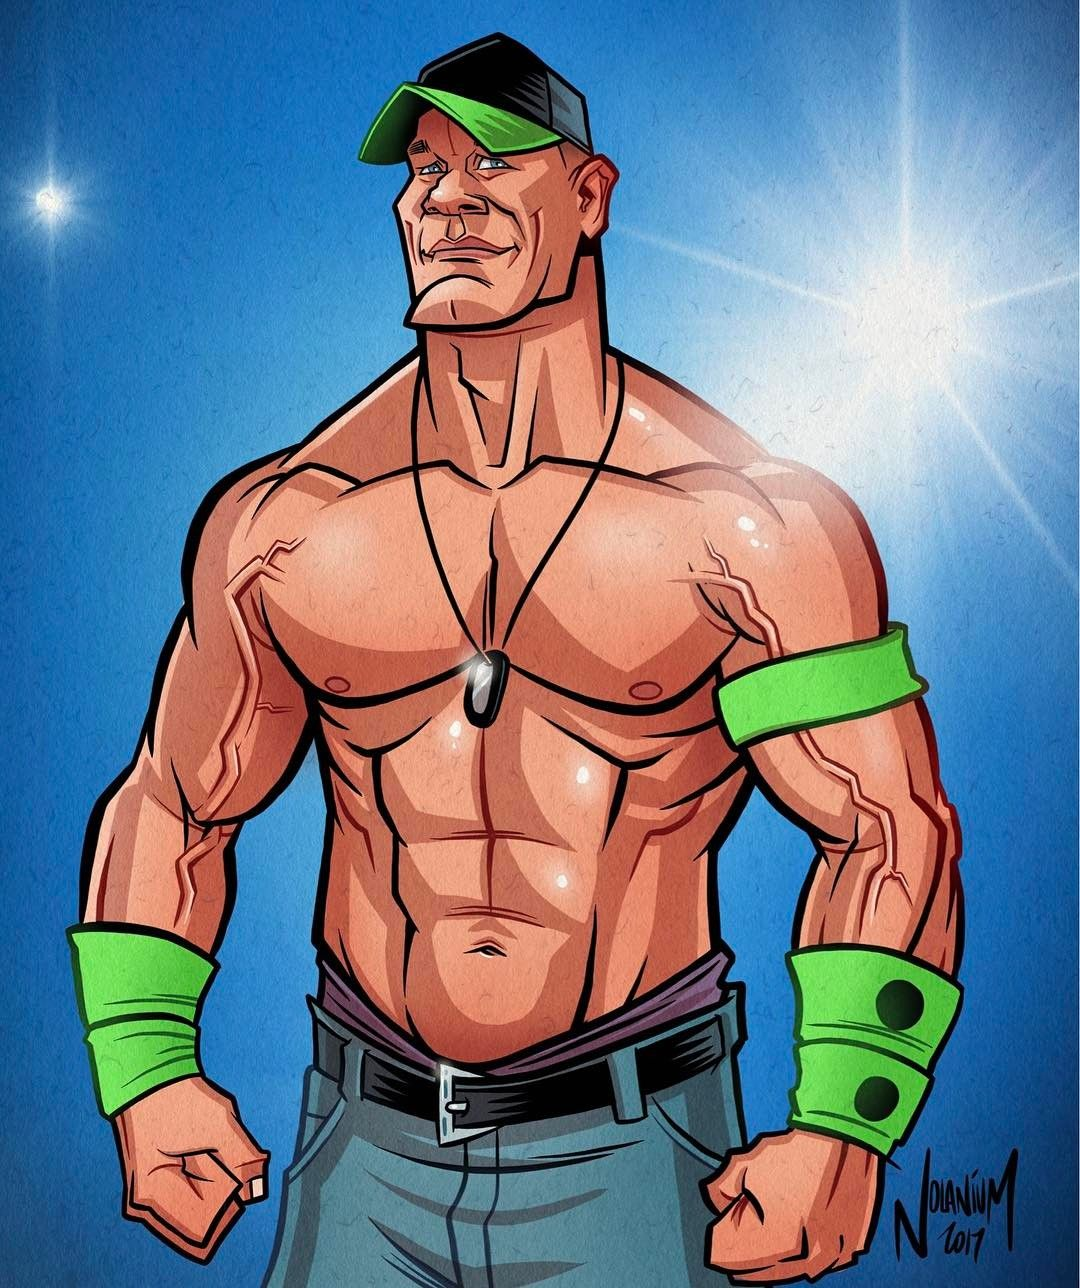 John Cena By Nolanium John Cena Caricature Sketch Pro Wrestling